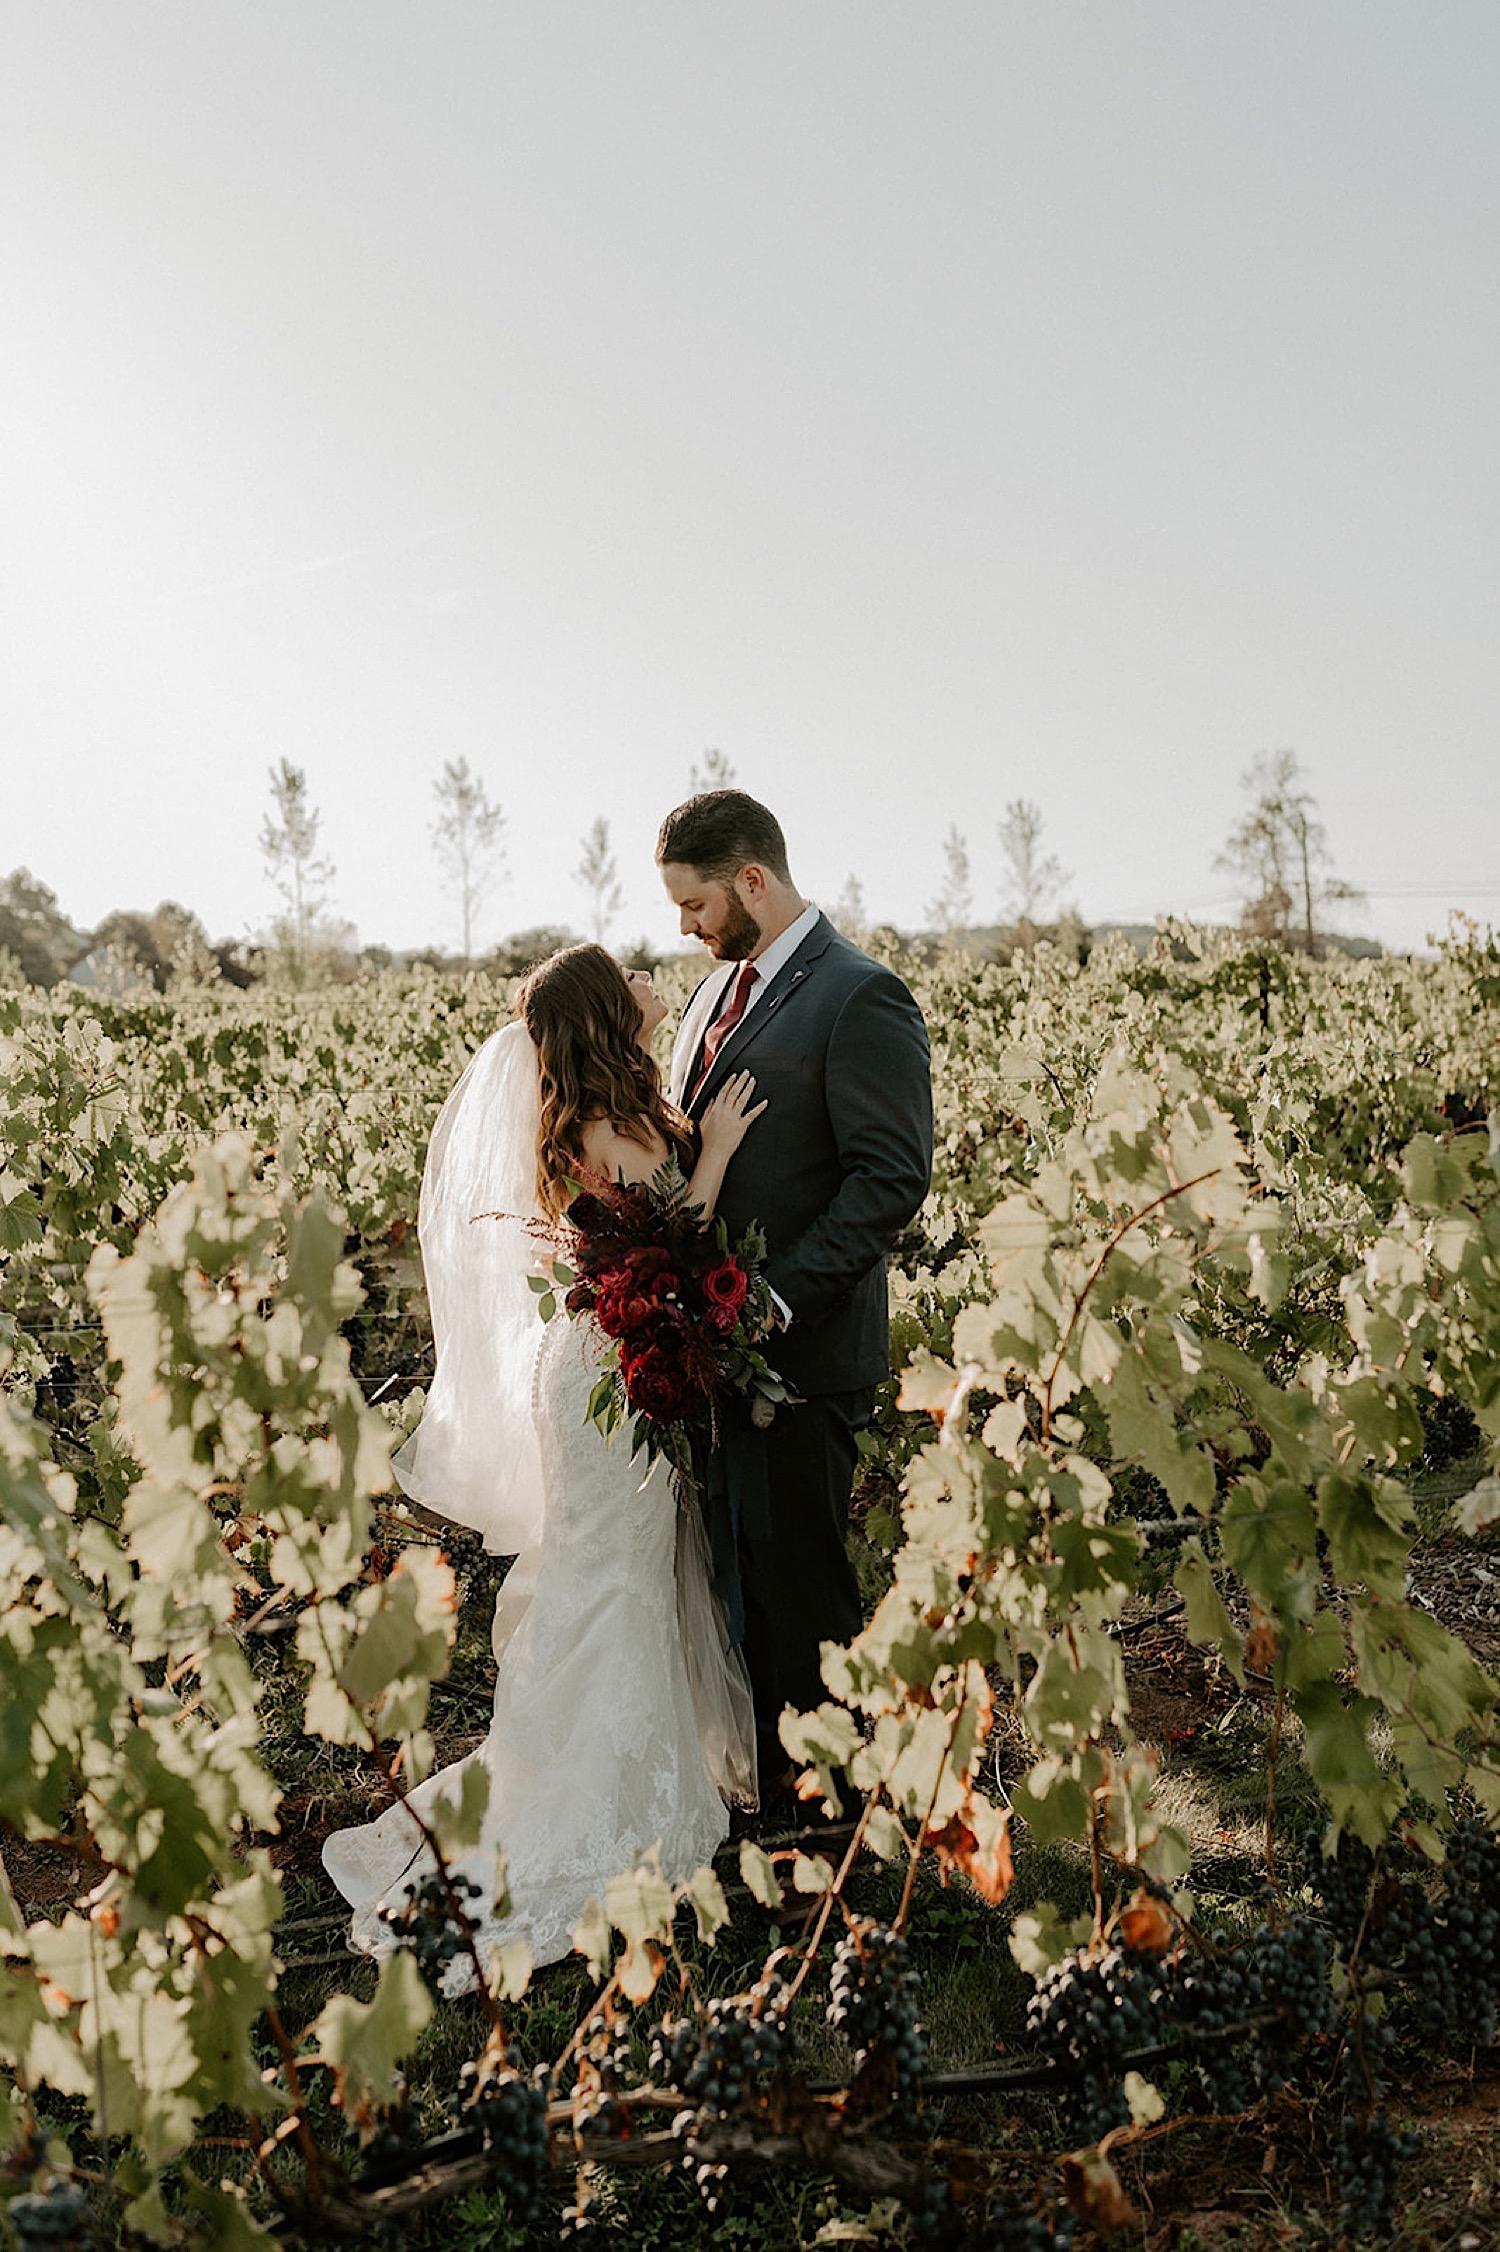 031 Hopewell Valley Vineyards Wedding New Jersey Wedding Photographer Vineyards Wedding Burgundy Wedding Inspiration Boho Wedding Inspiration